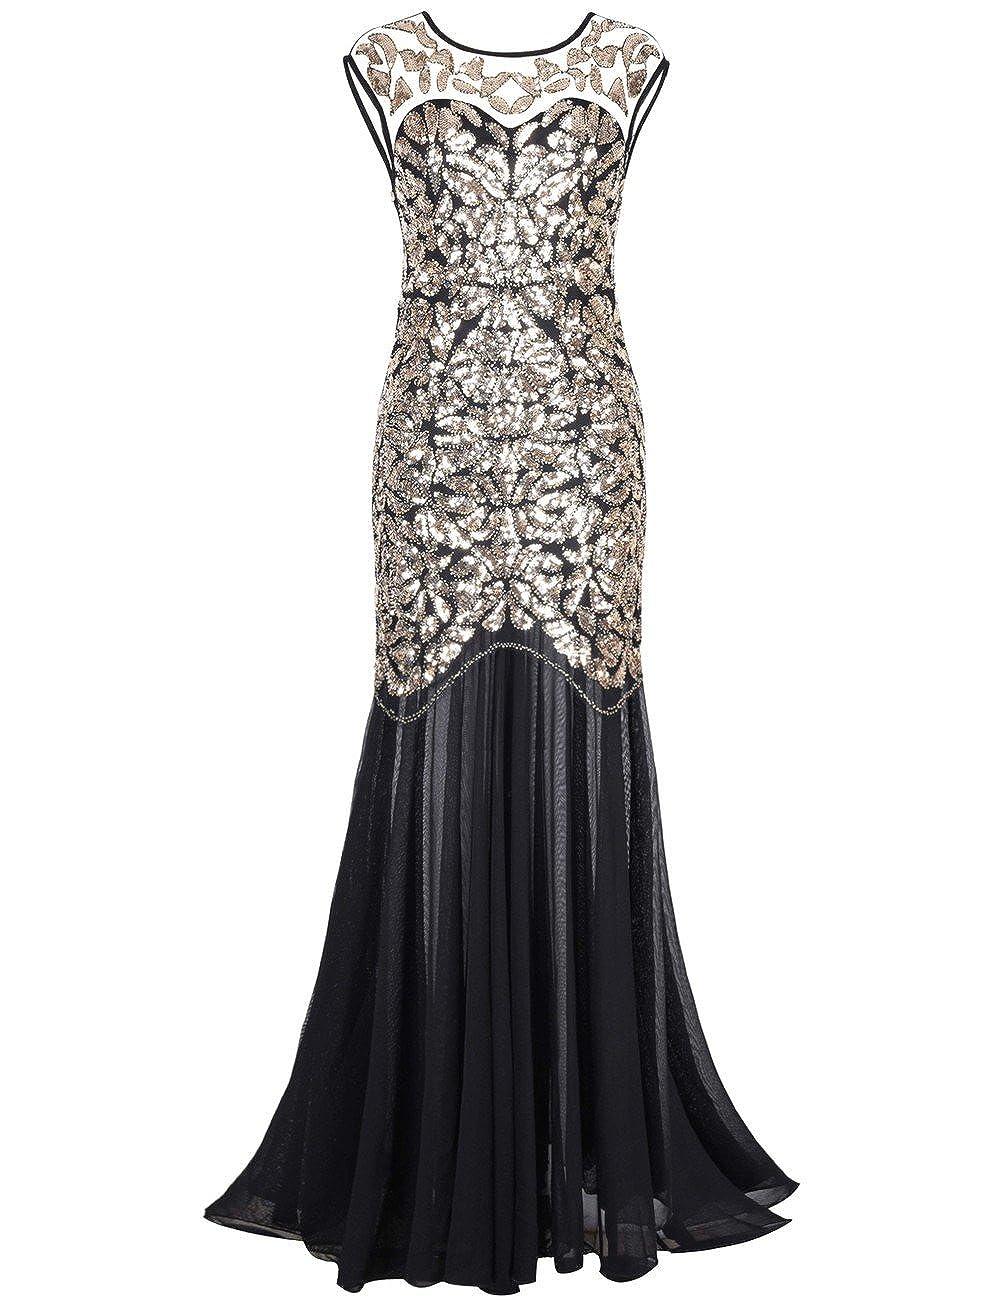 kayamiya Women's 1920s Gown Beaded Sequined Maxi Long Gatsby Mermaid Evening Dress HH22a9